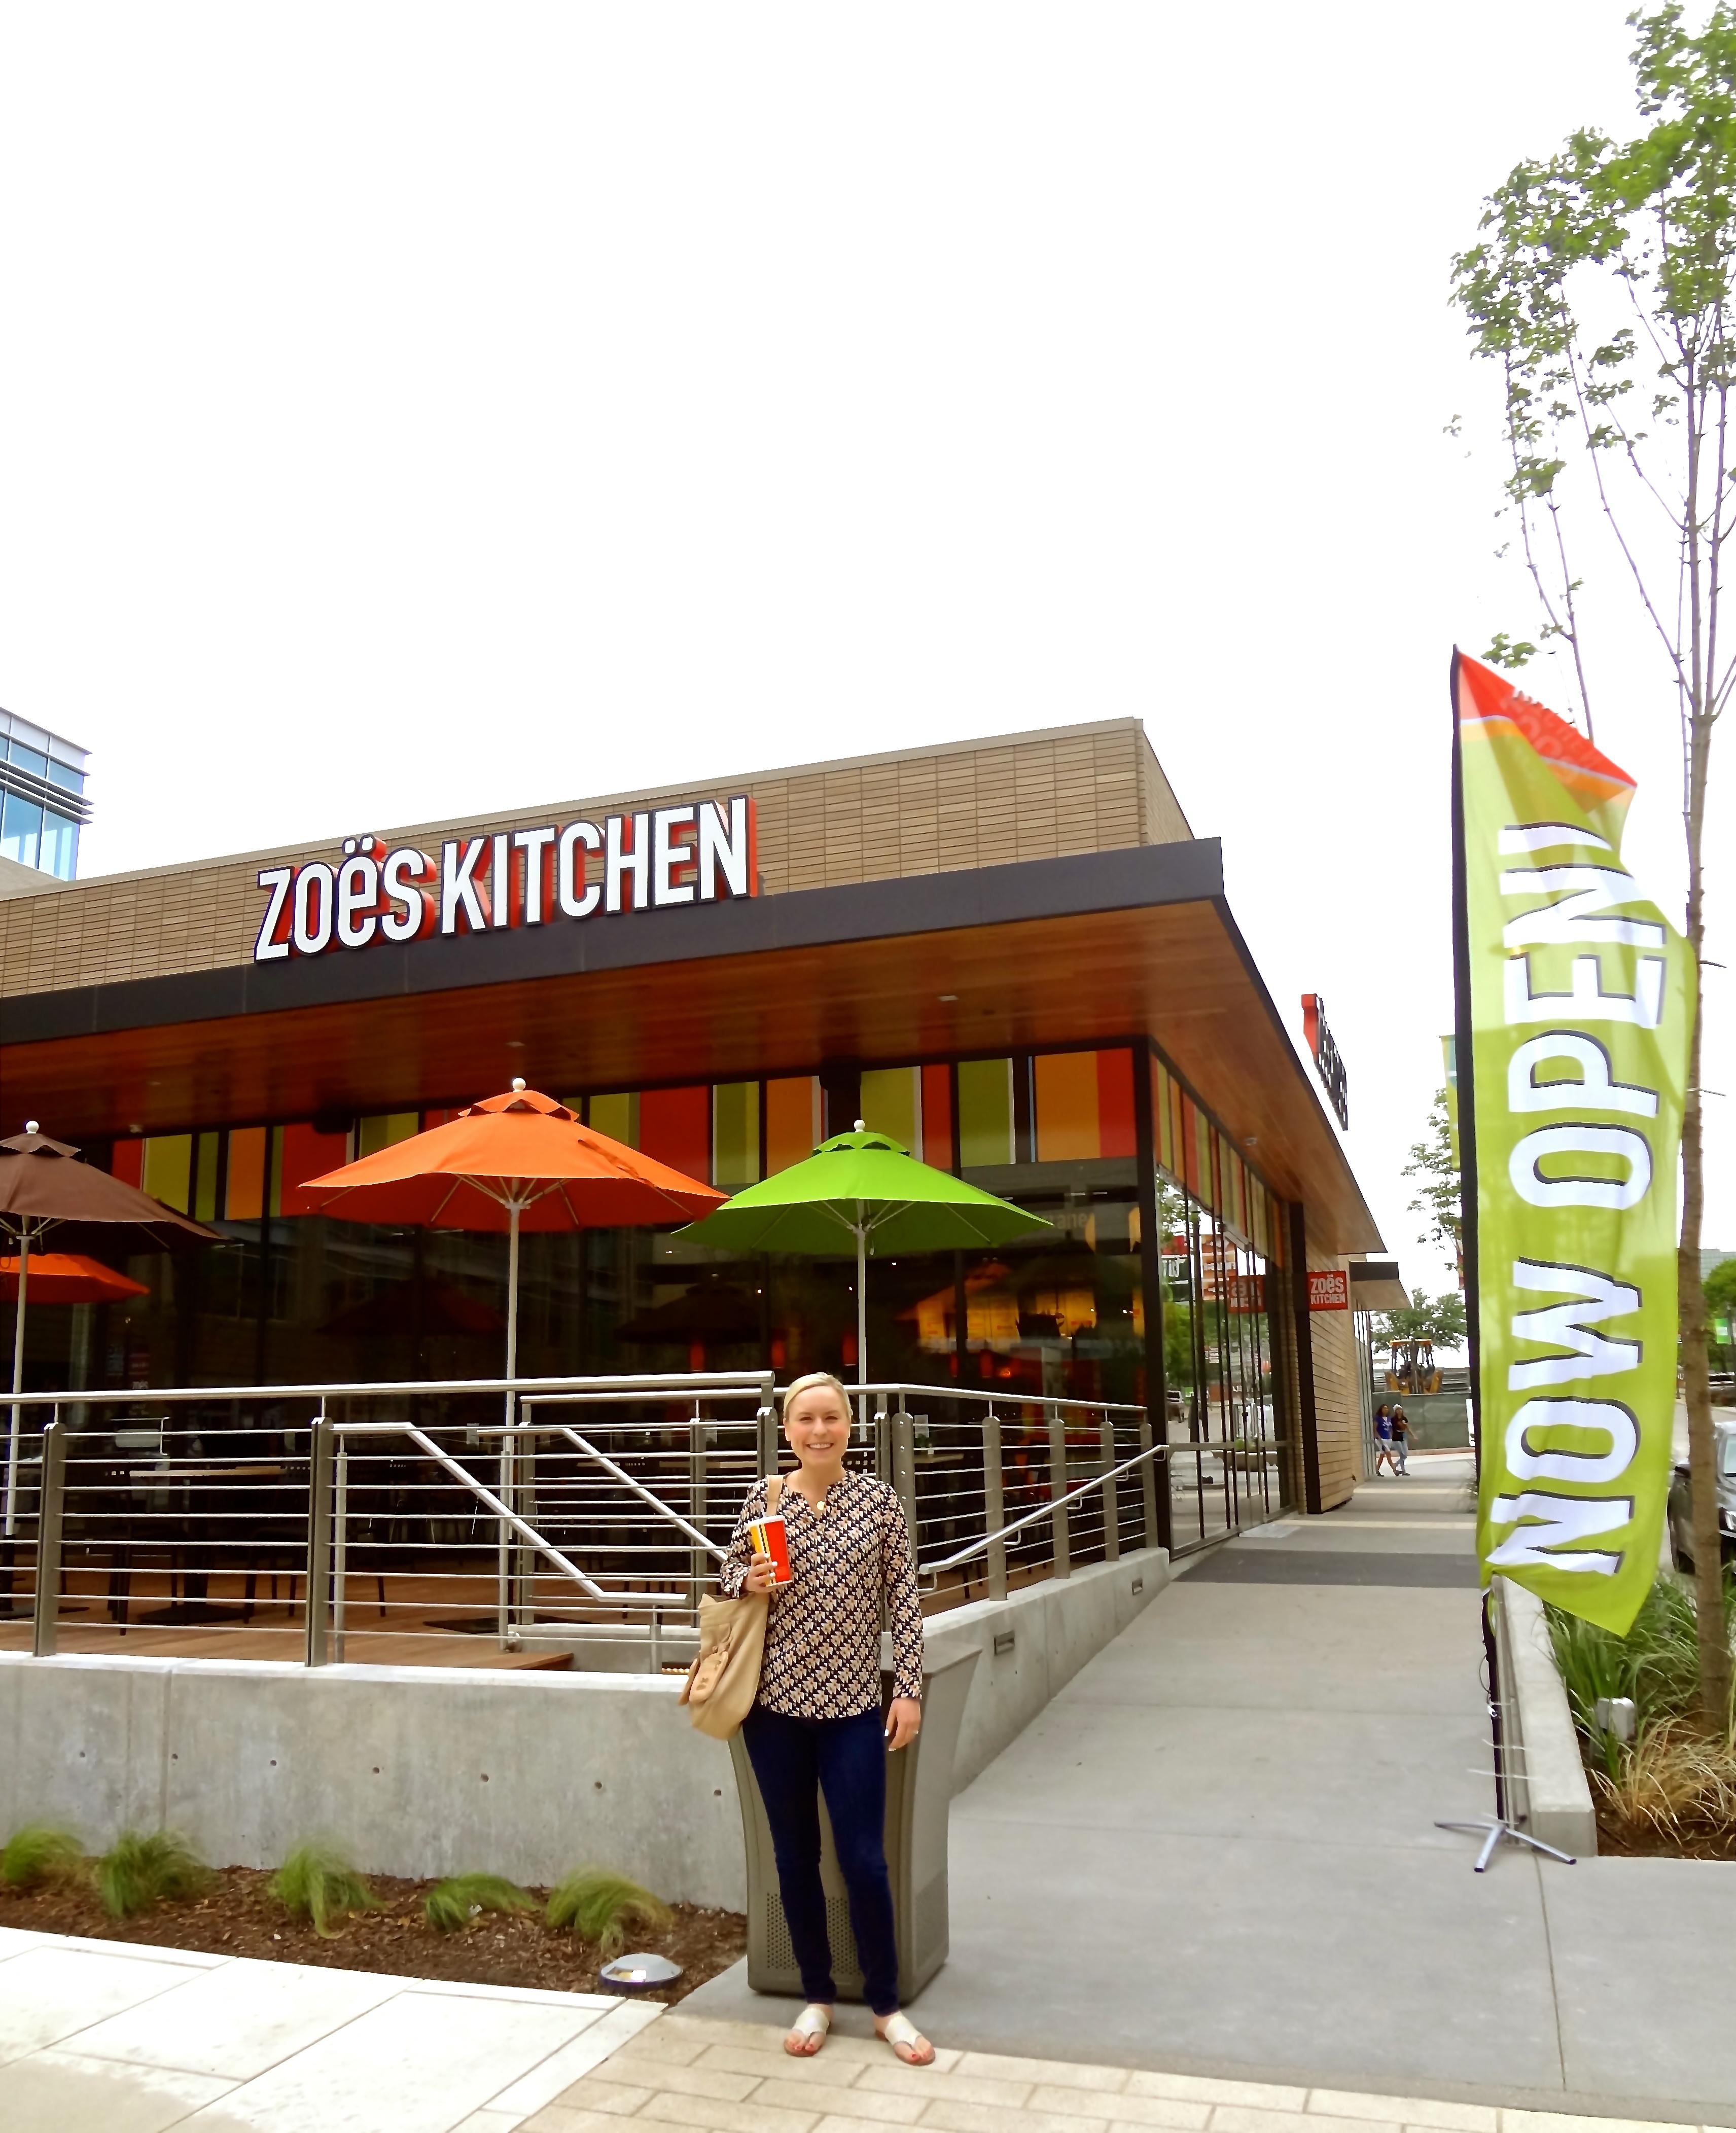 Zoe Kitchen: Fortuitous Foodies